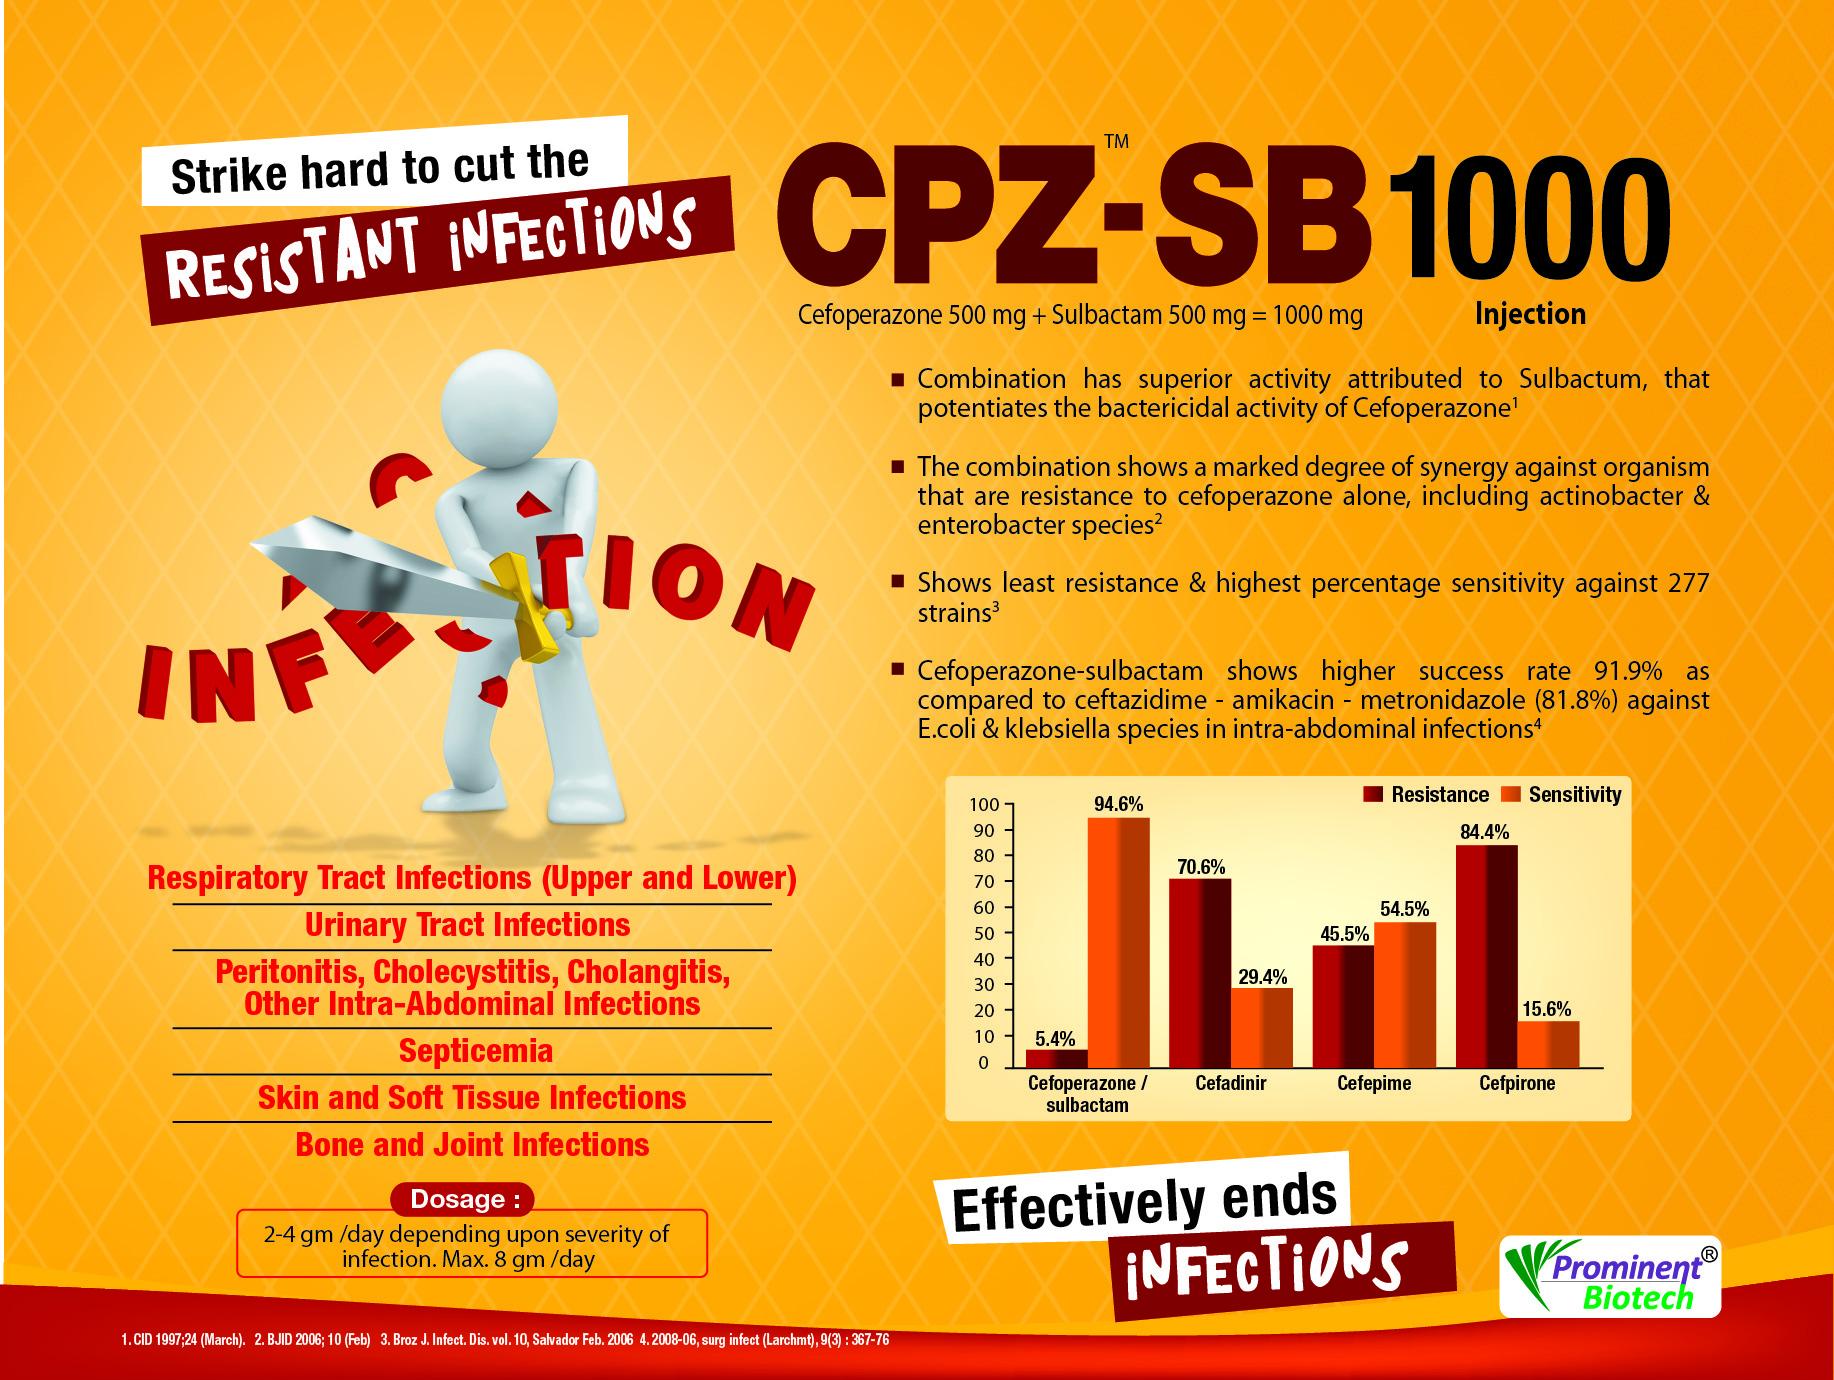 Cefoperazone 1000 Mg & Sulbactam 500 Mg Eqvt. 1.5 Gm